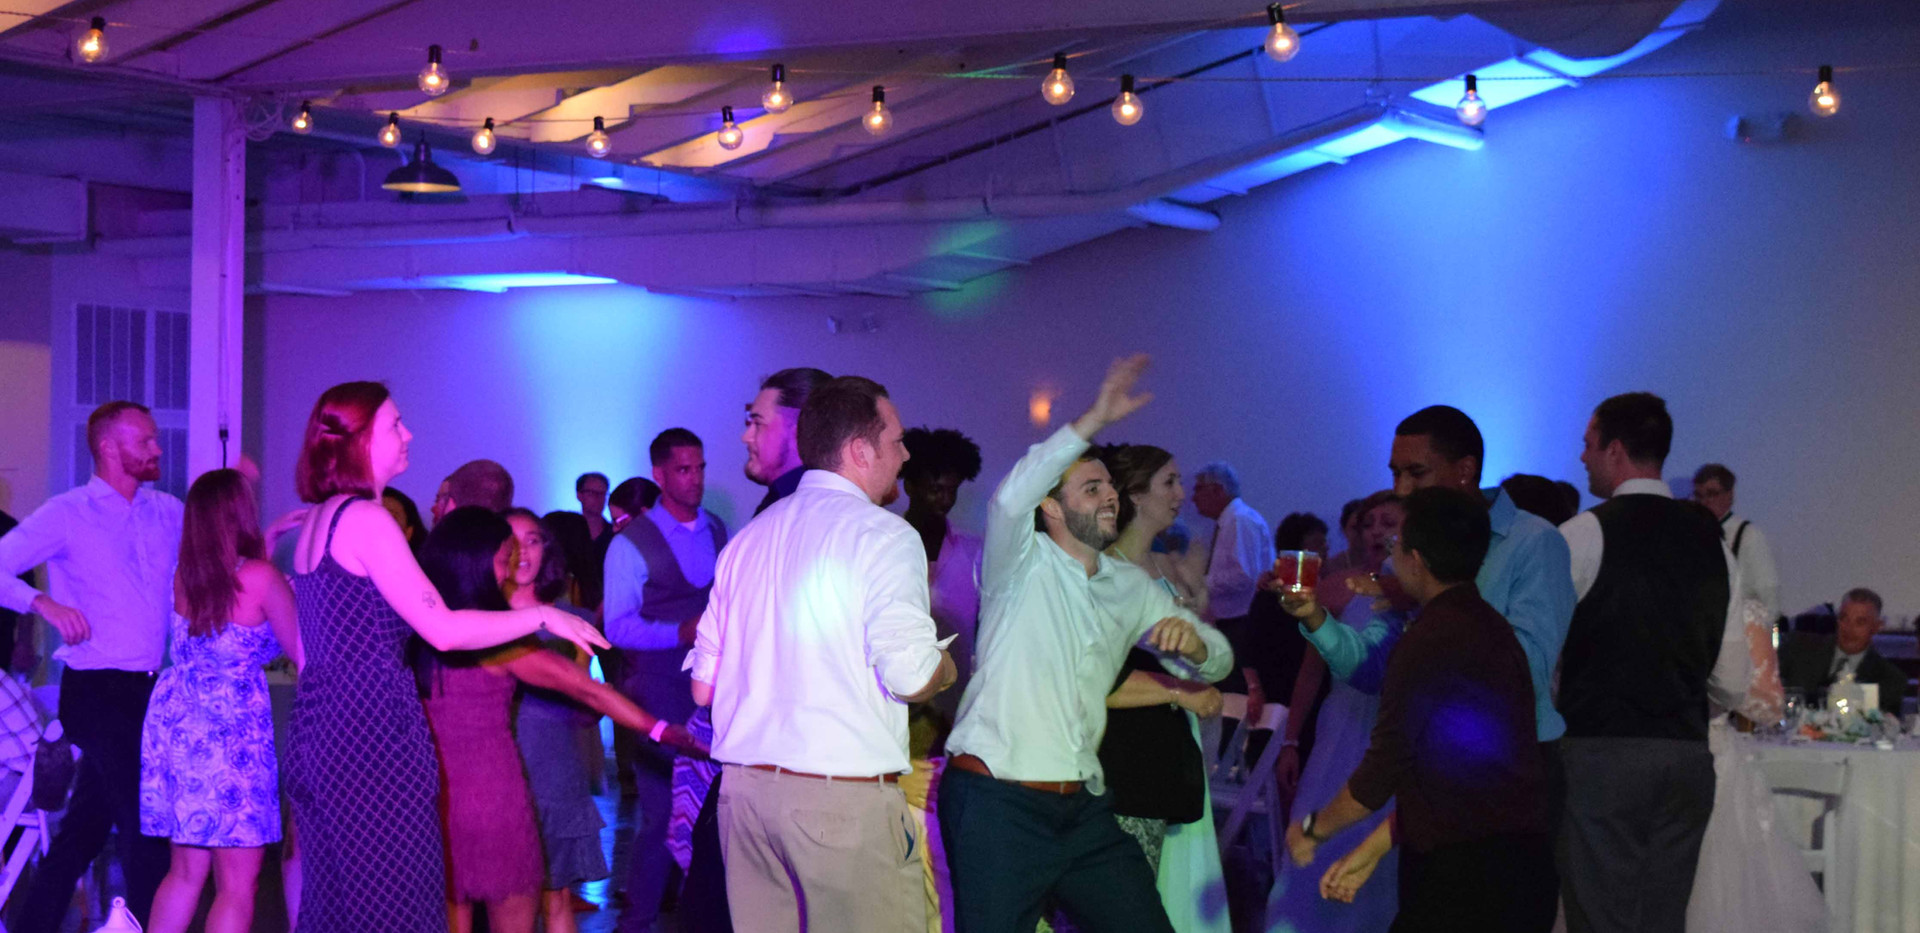 Wedding DJ Service in Rocky Point NC offering an affordable wedding dj.